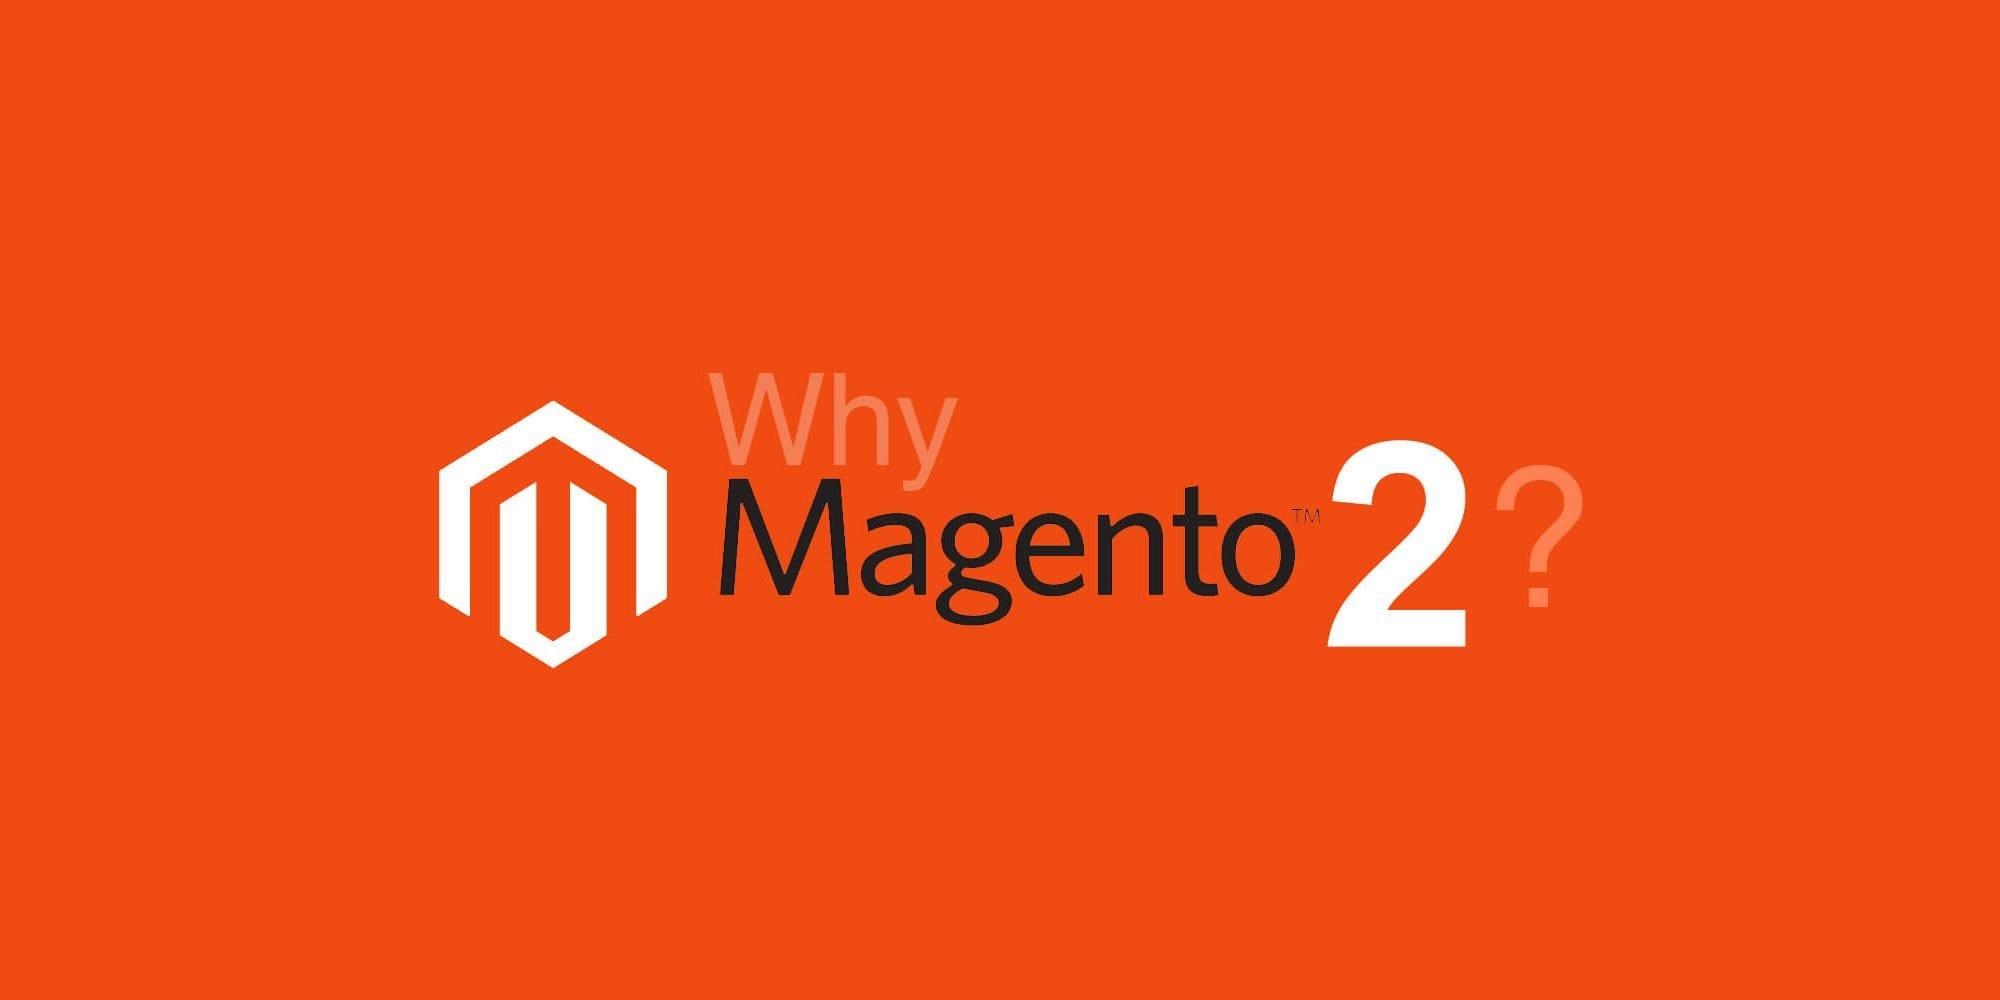 Why Magento 2